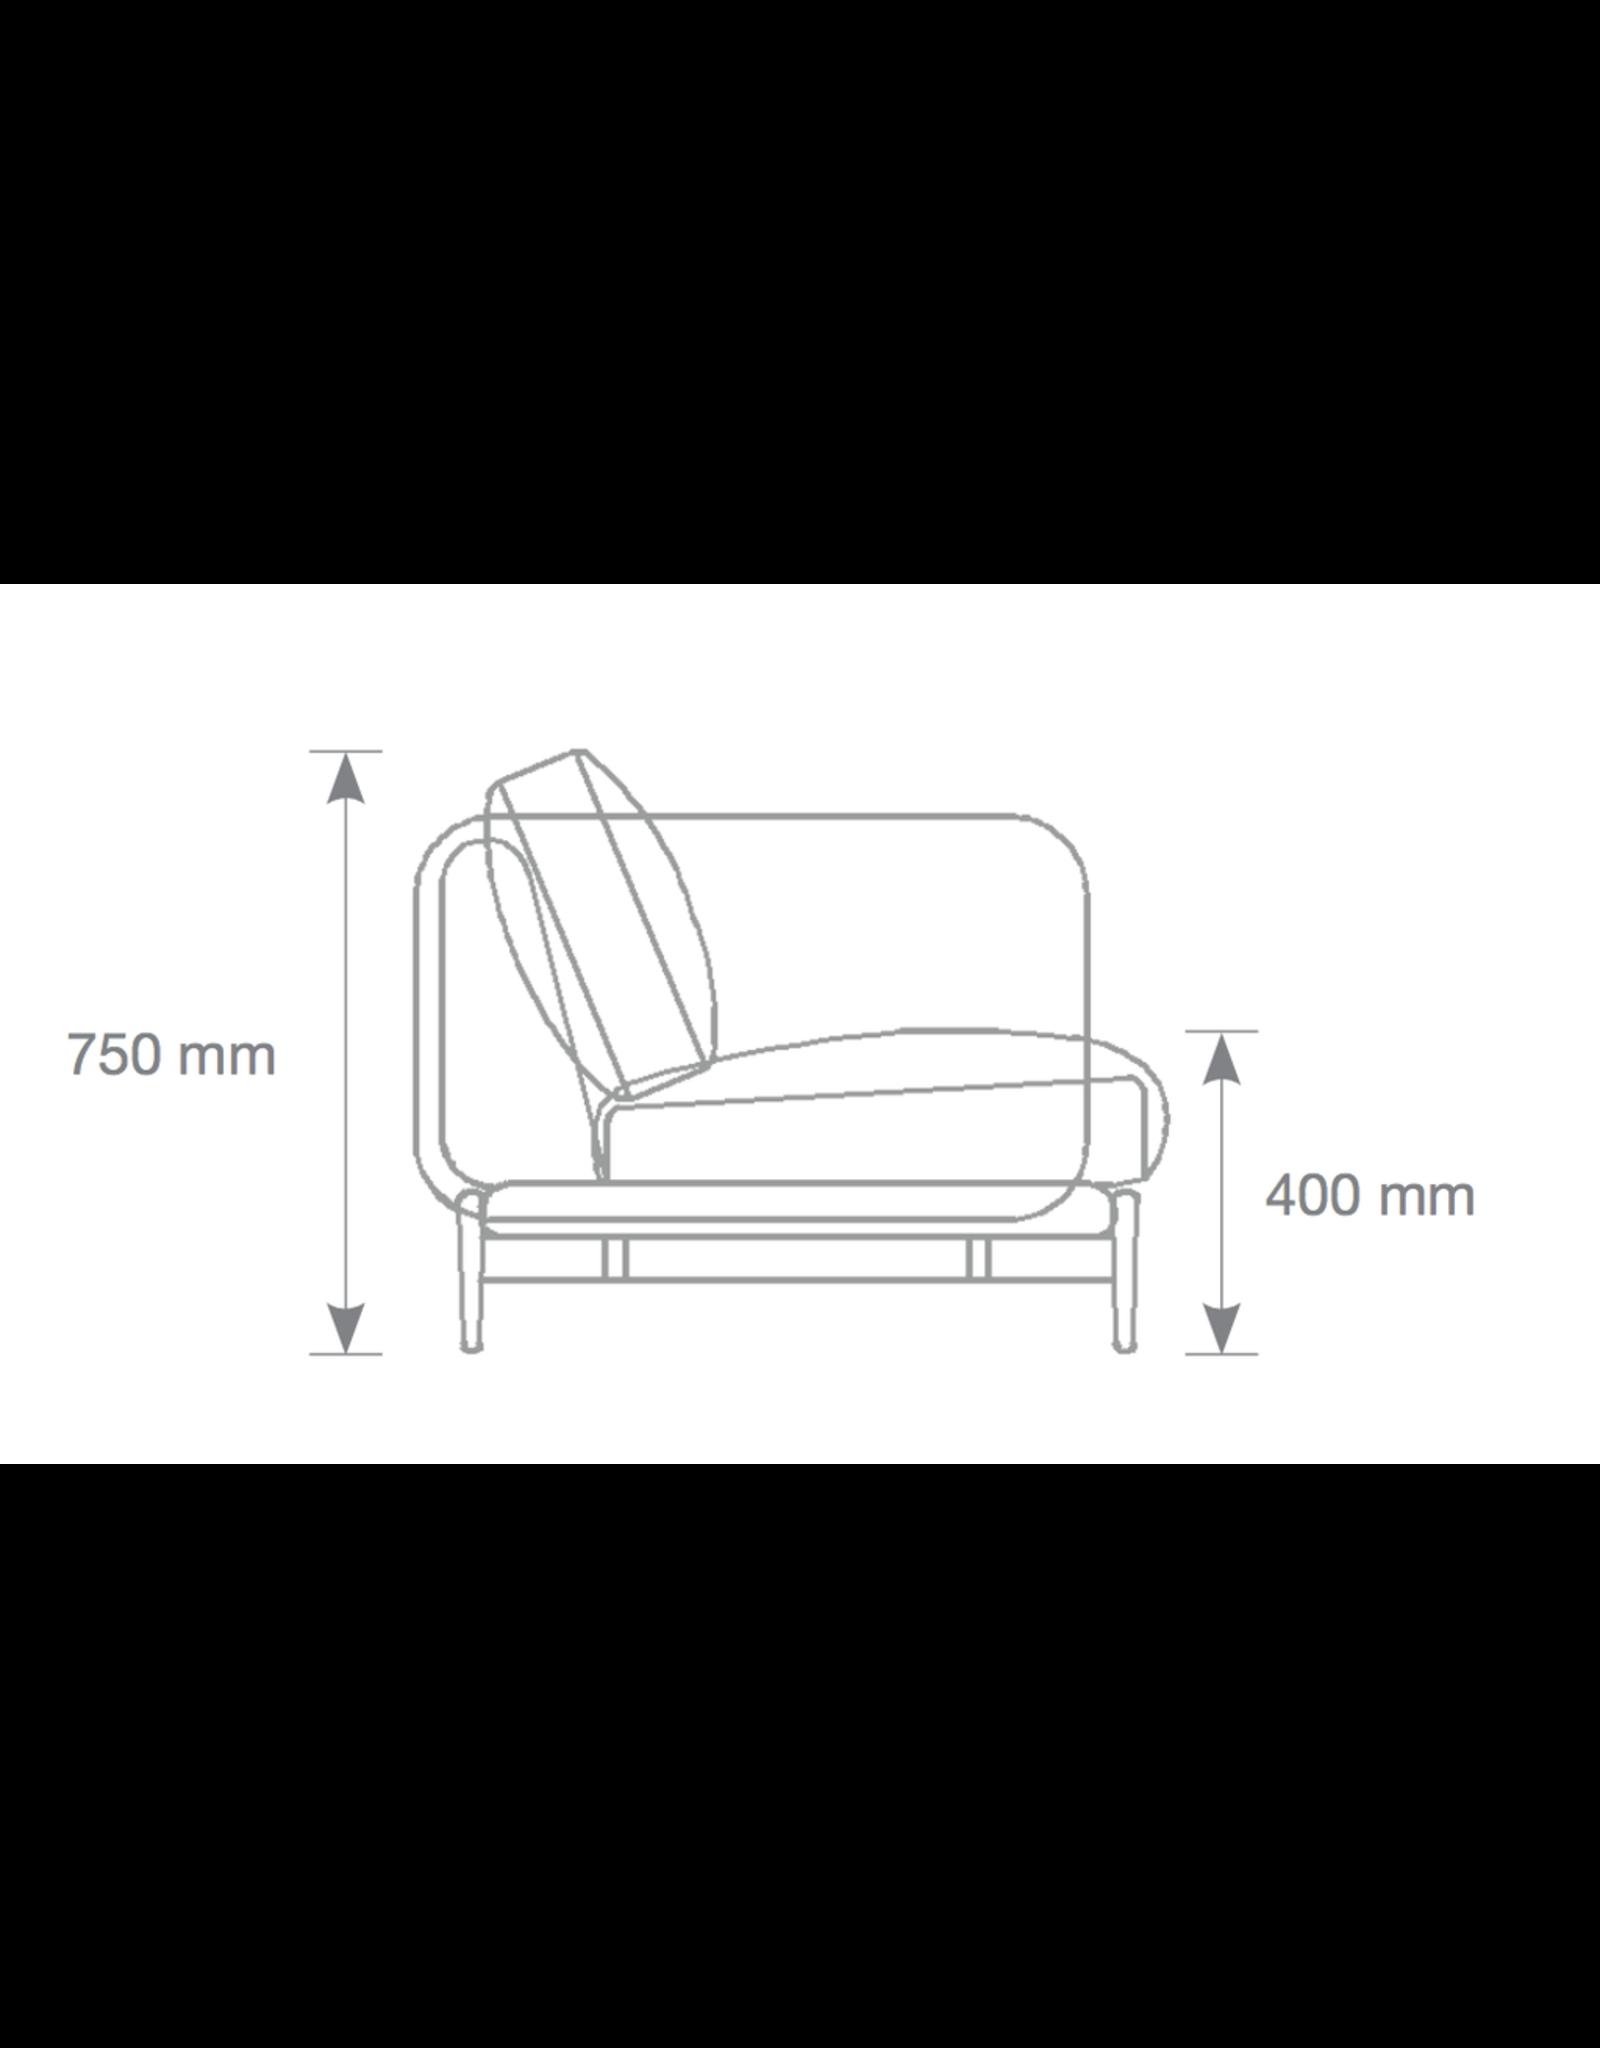 SURFACE L型沙发